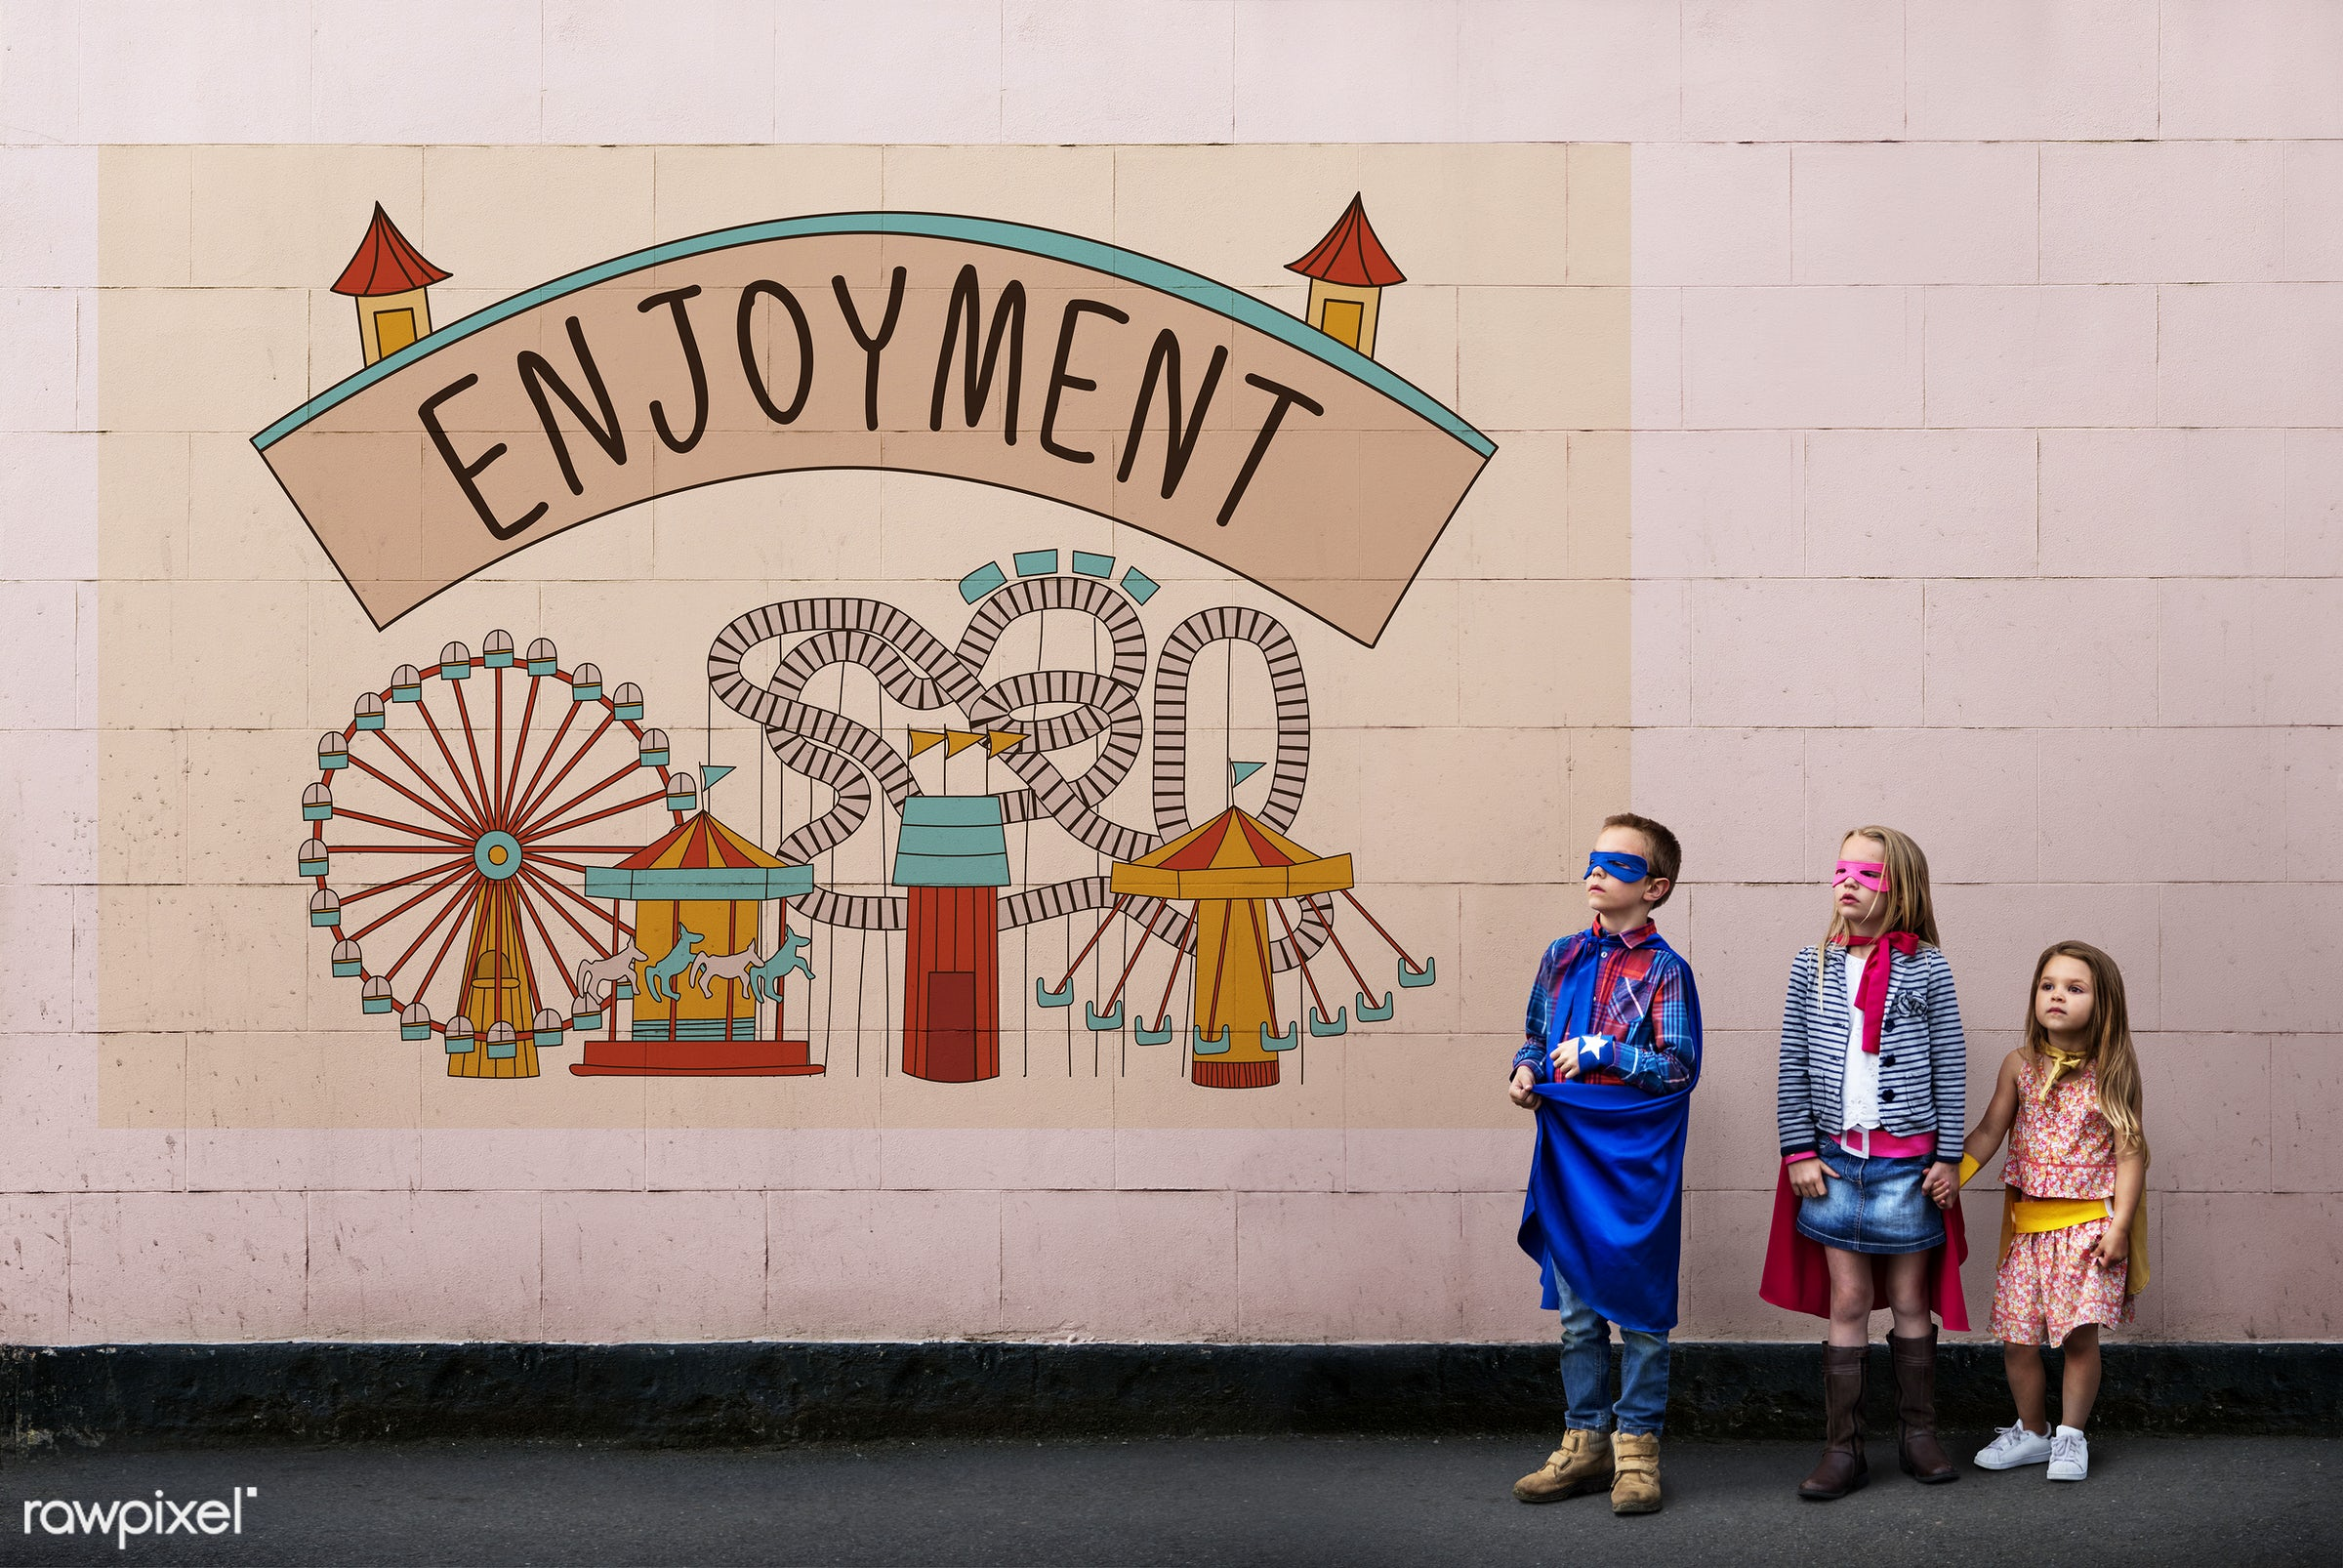 amusement, attraction, boy, brave, brother, childhood, costume, creative, doodle, dressed up, enjoy, enjoyment,...